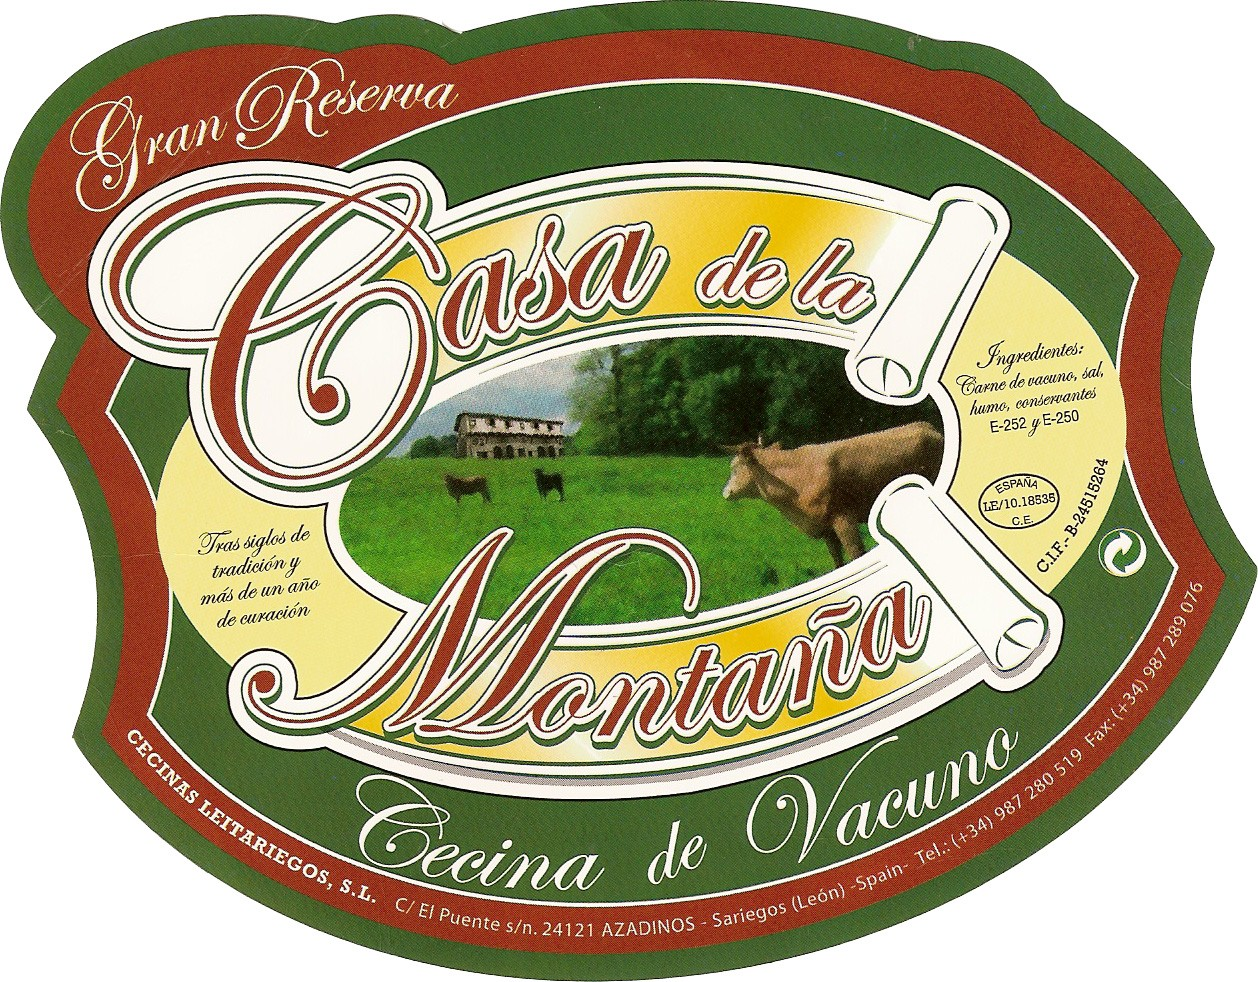 Cecinas Leitariegos-Embutidos Casa de la Montaña